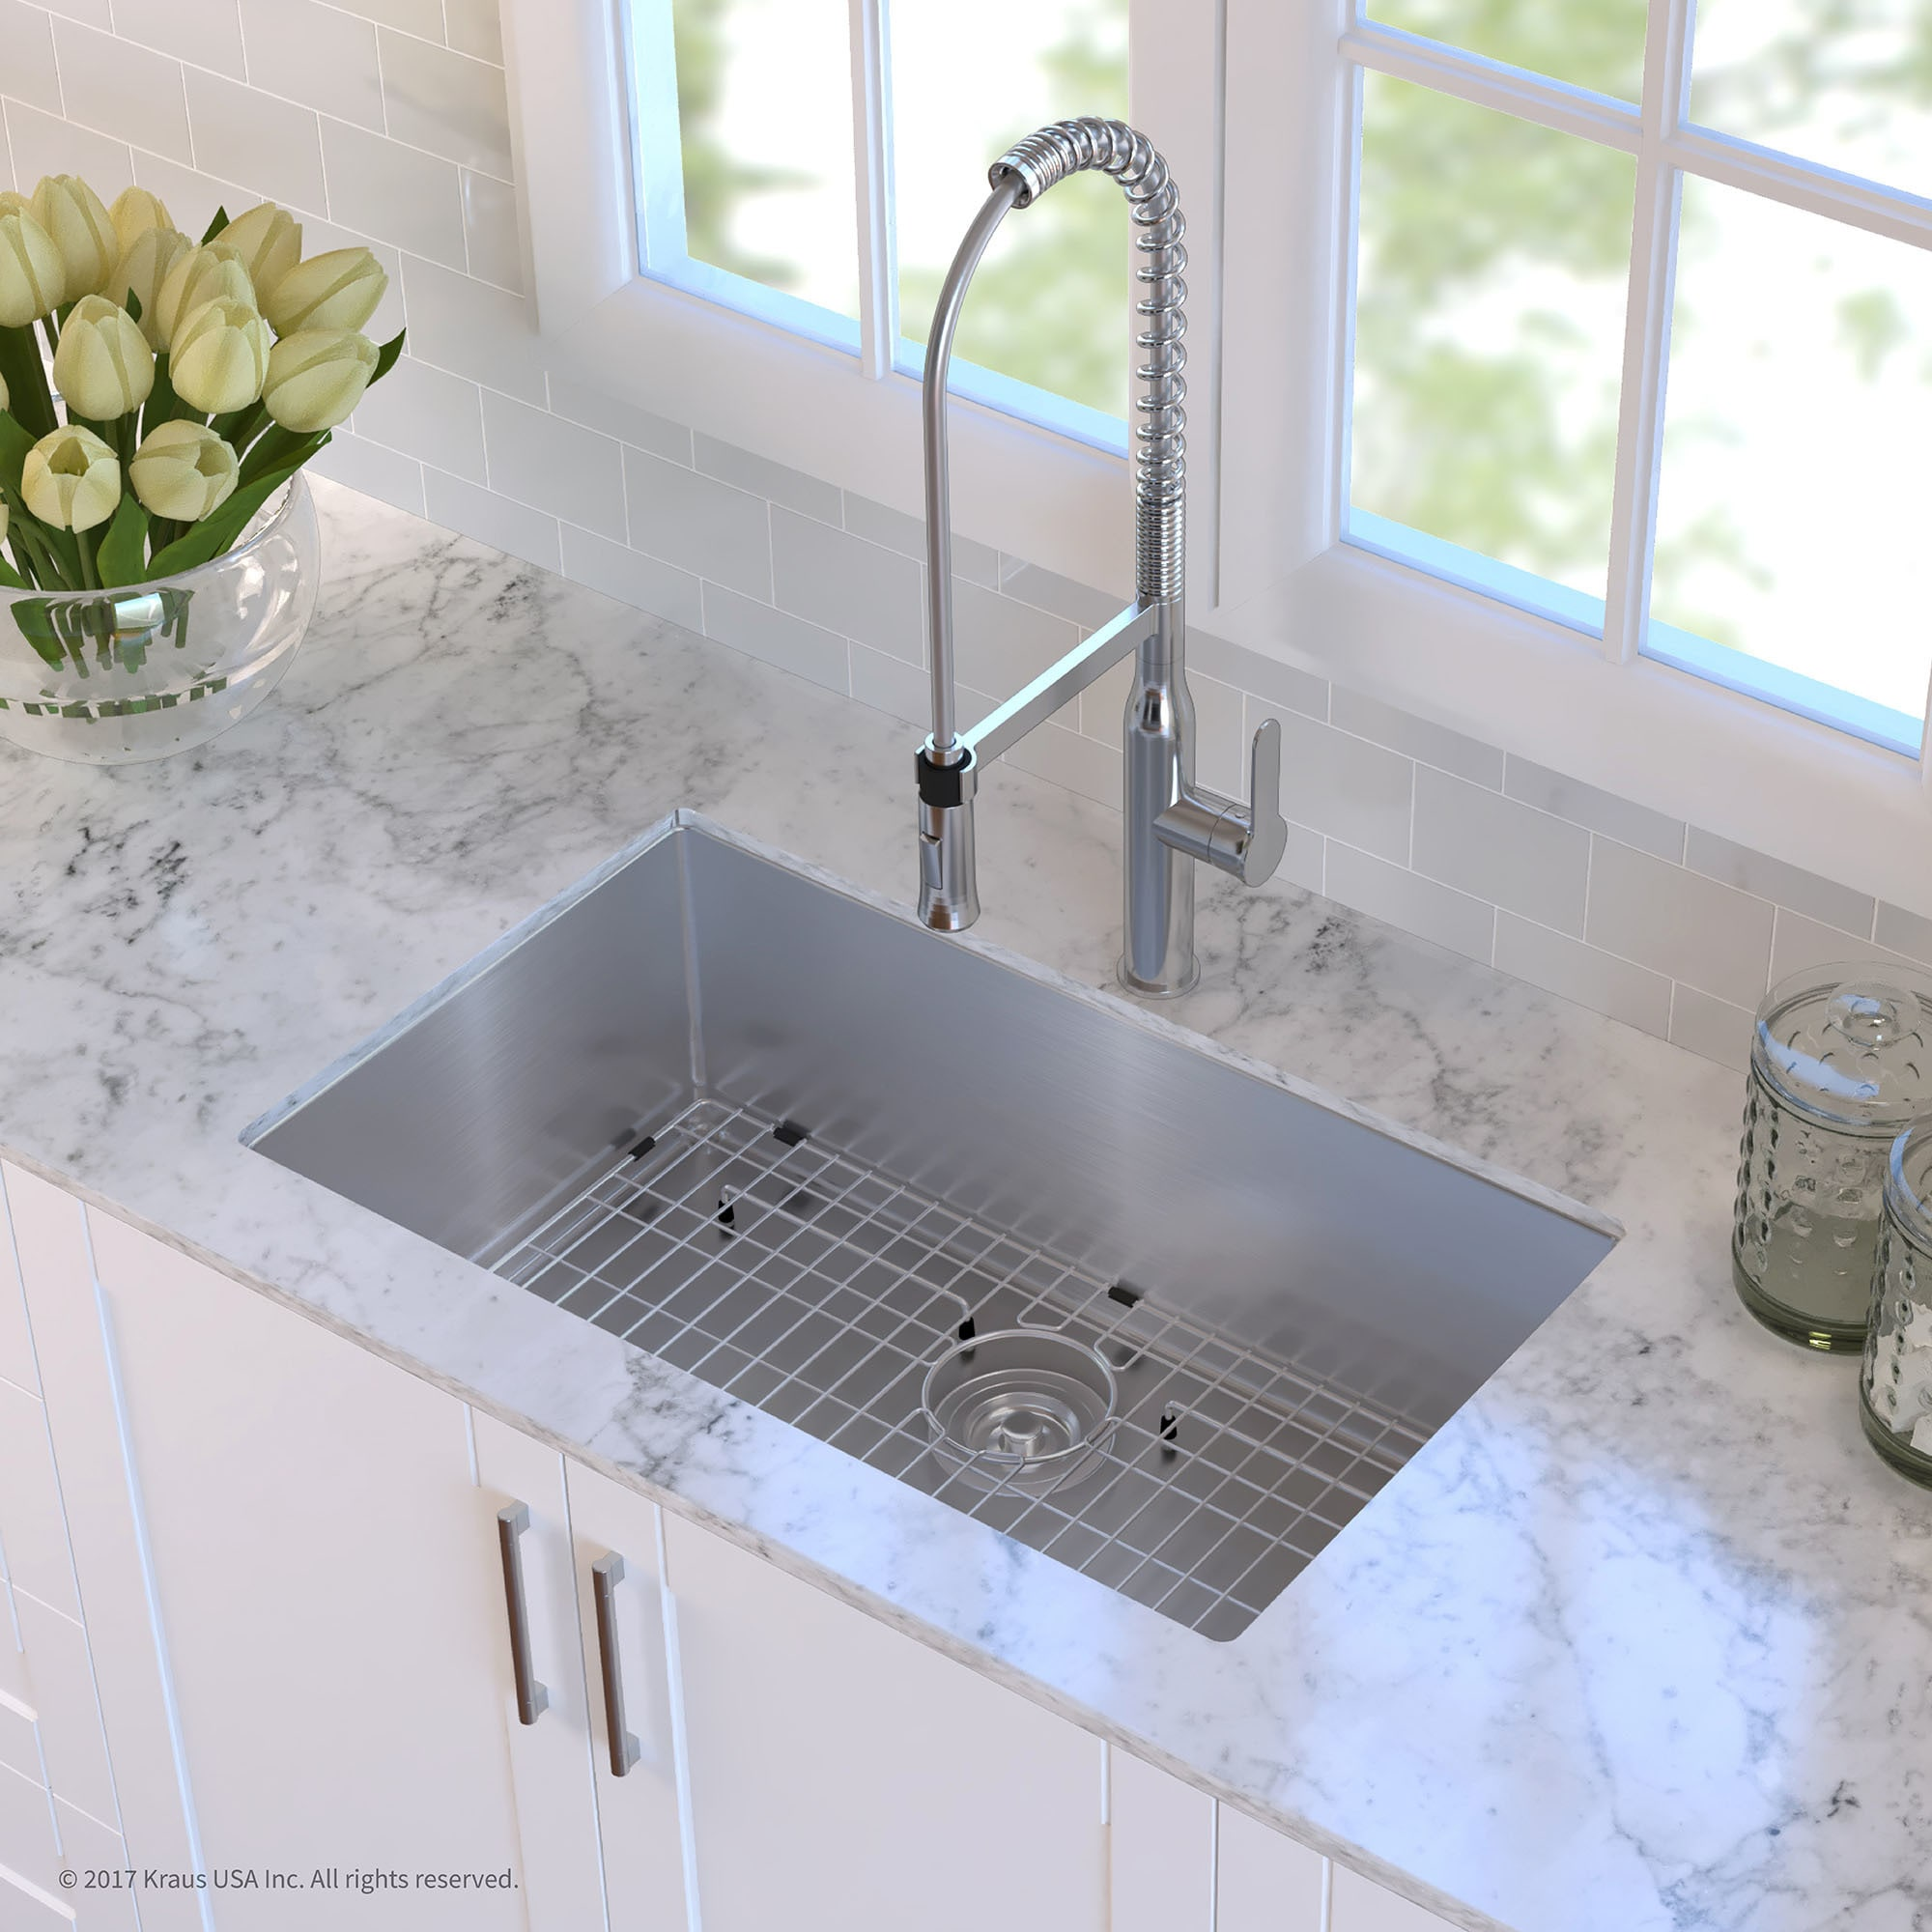 30 inch kitchen sink top mount shop kraus khu10030 standart pro undermount 30inch 16 gauge single bowl satin stainless steel kitchen sink free shipping today overstockcom 3381330